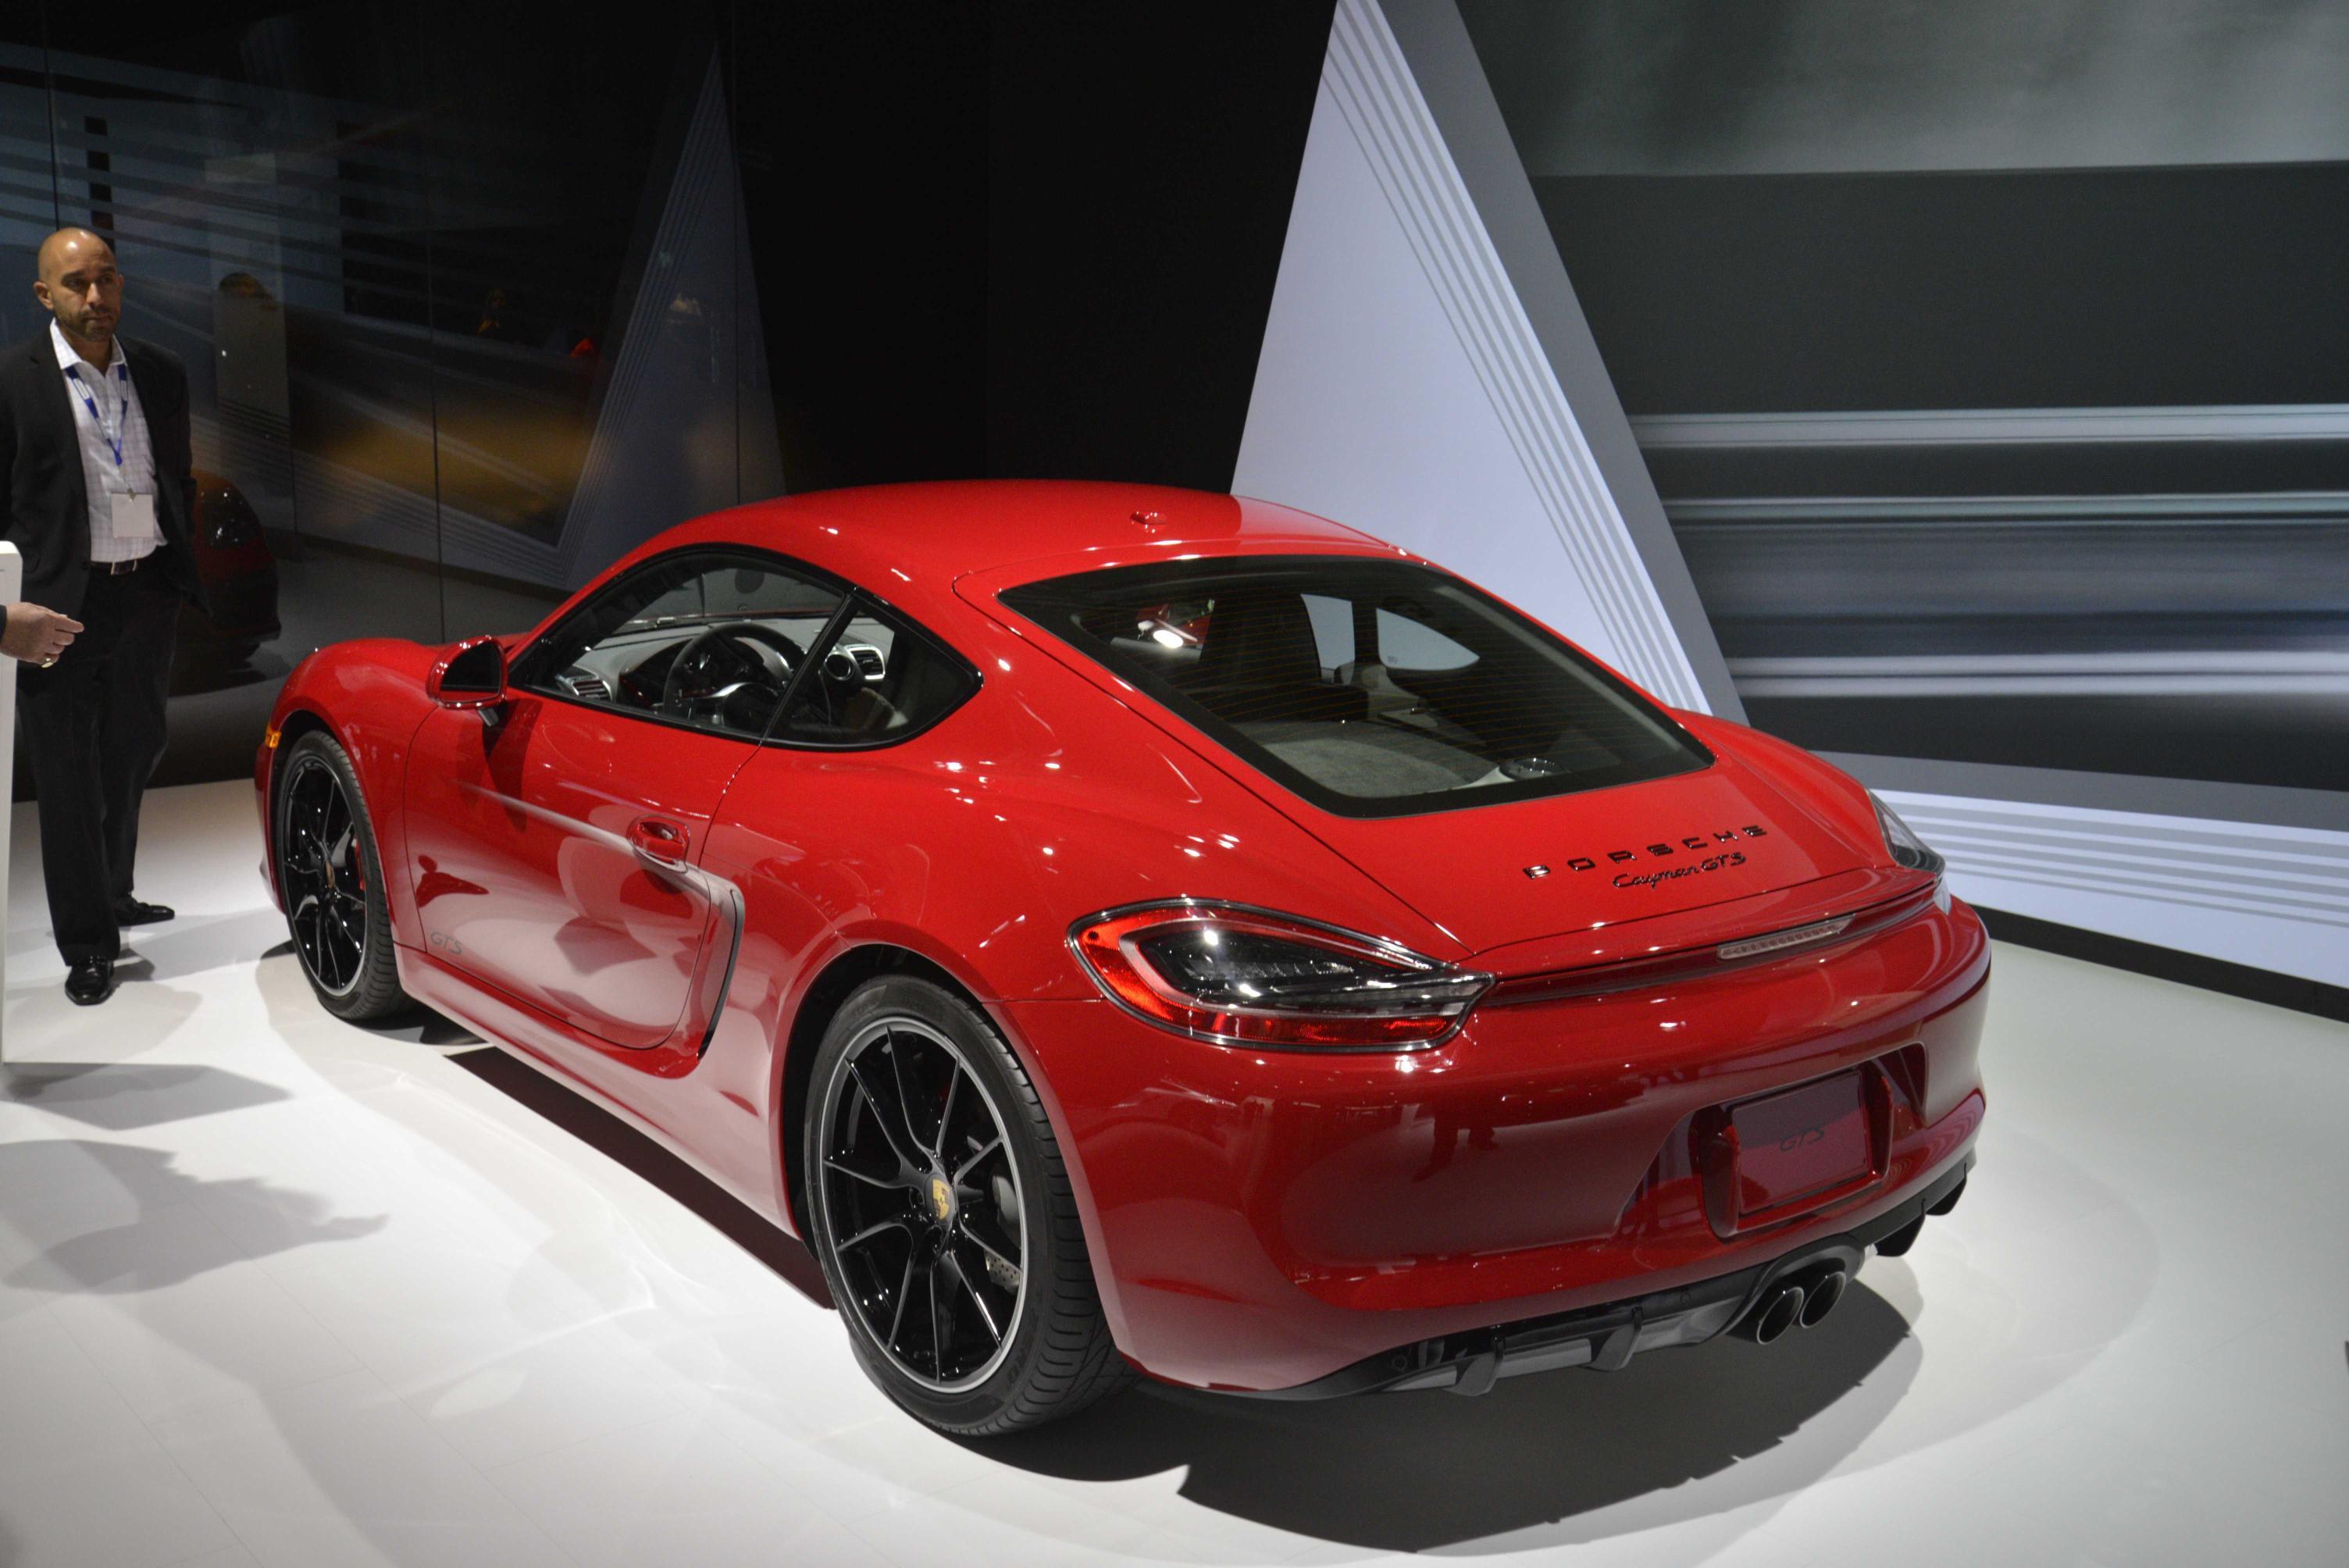 Porsche 911 Carrera GTS and 2015 Cayenne GTS Paint LA in